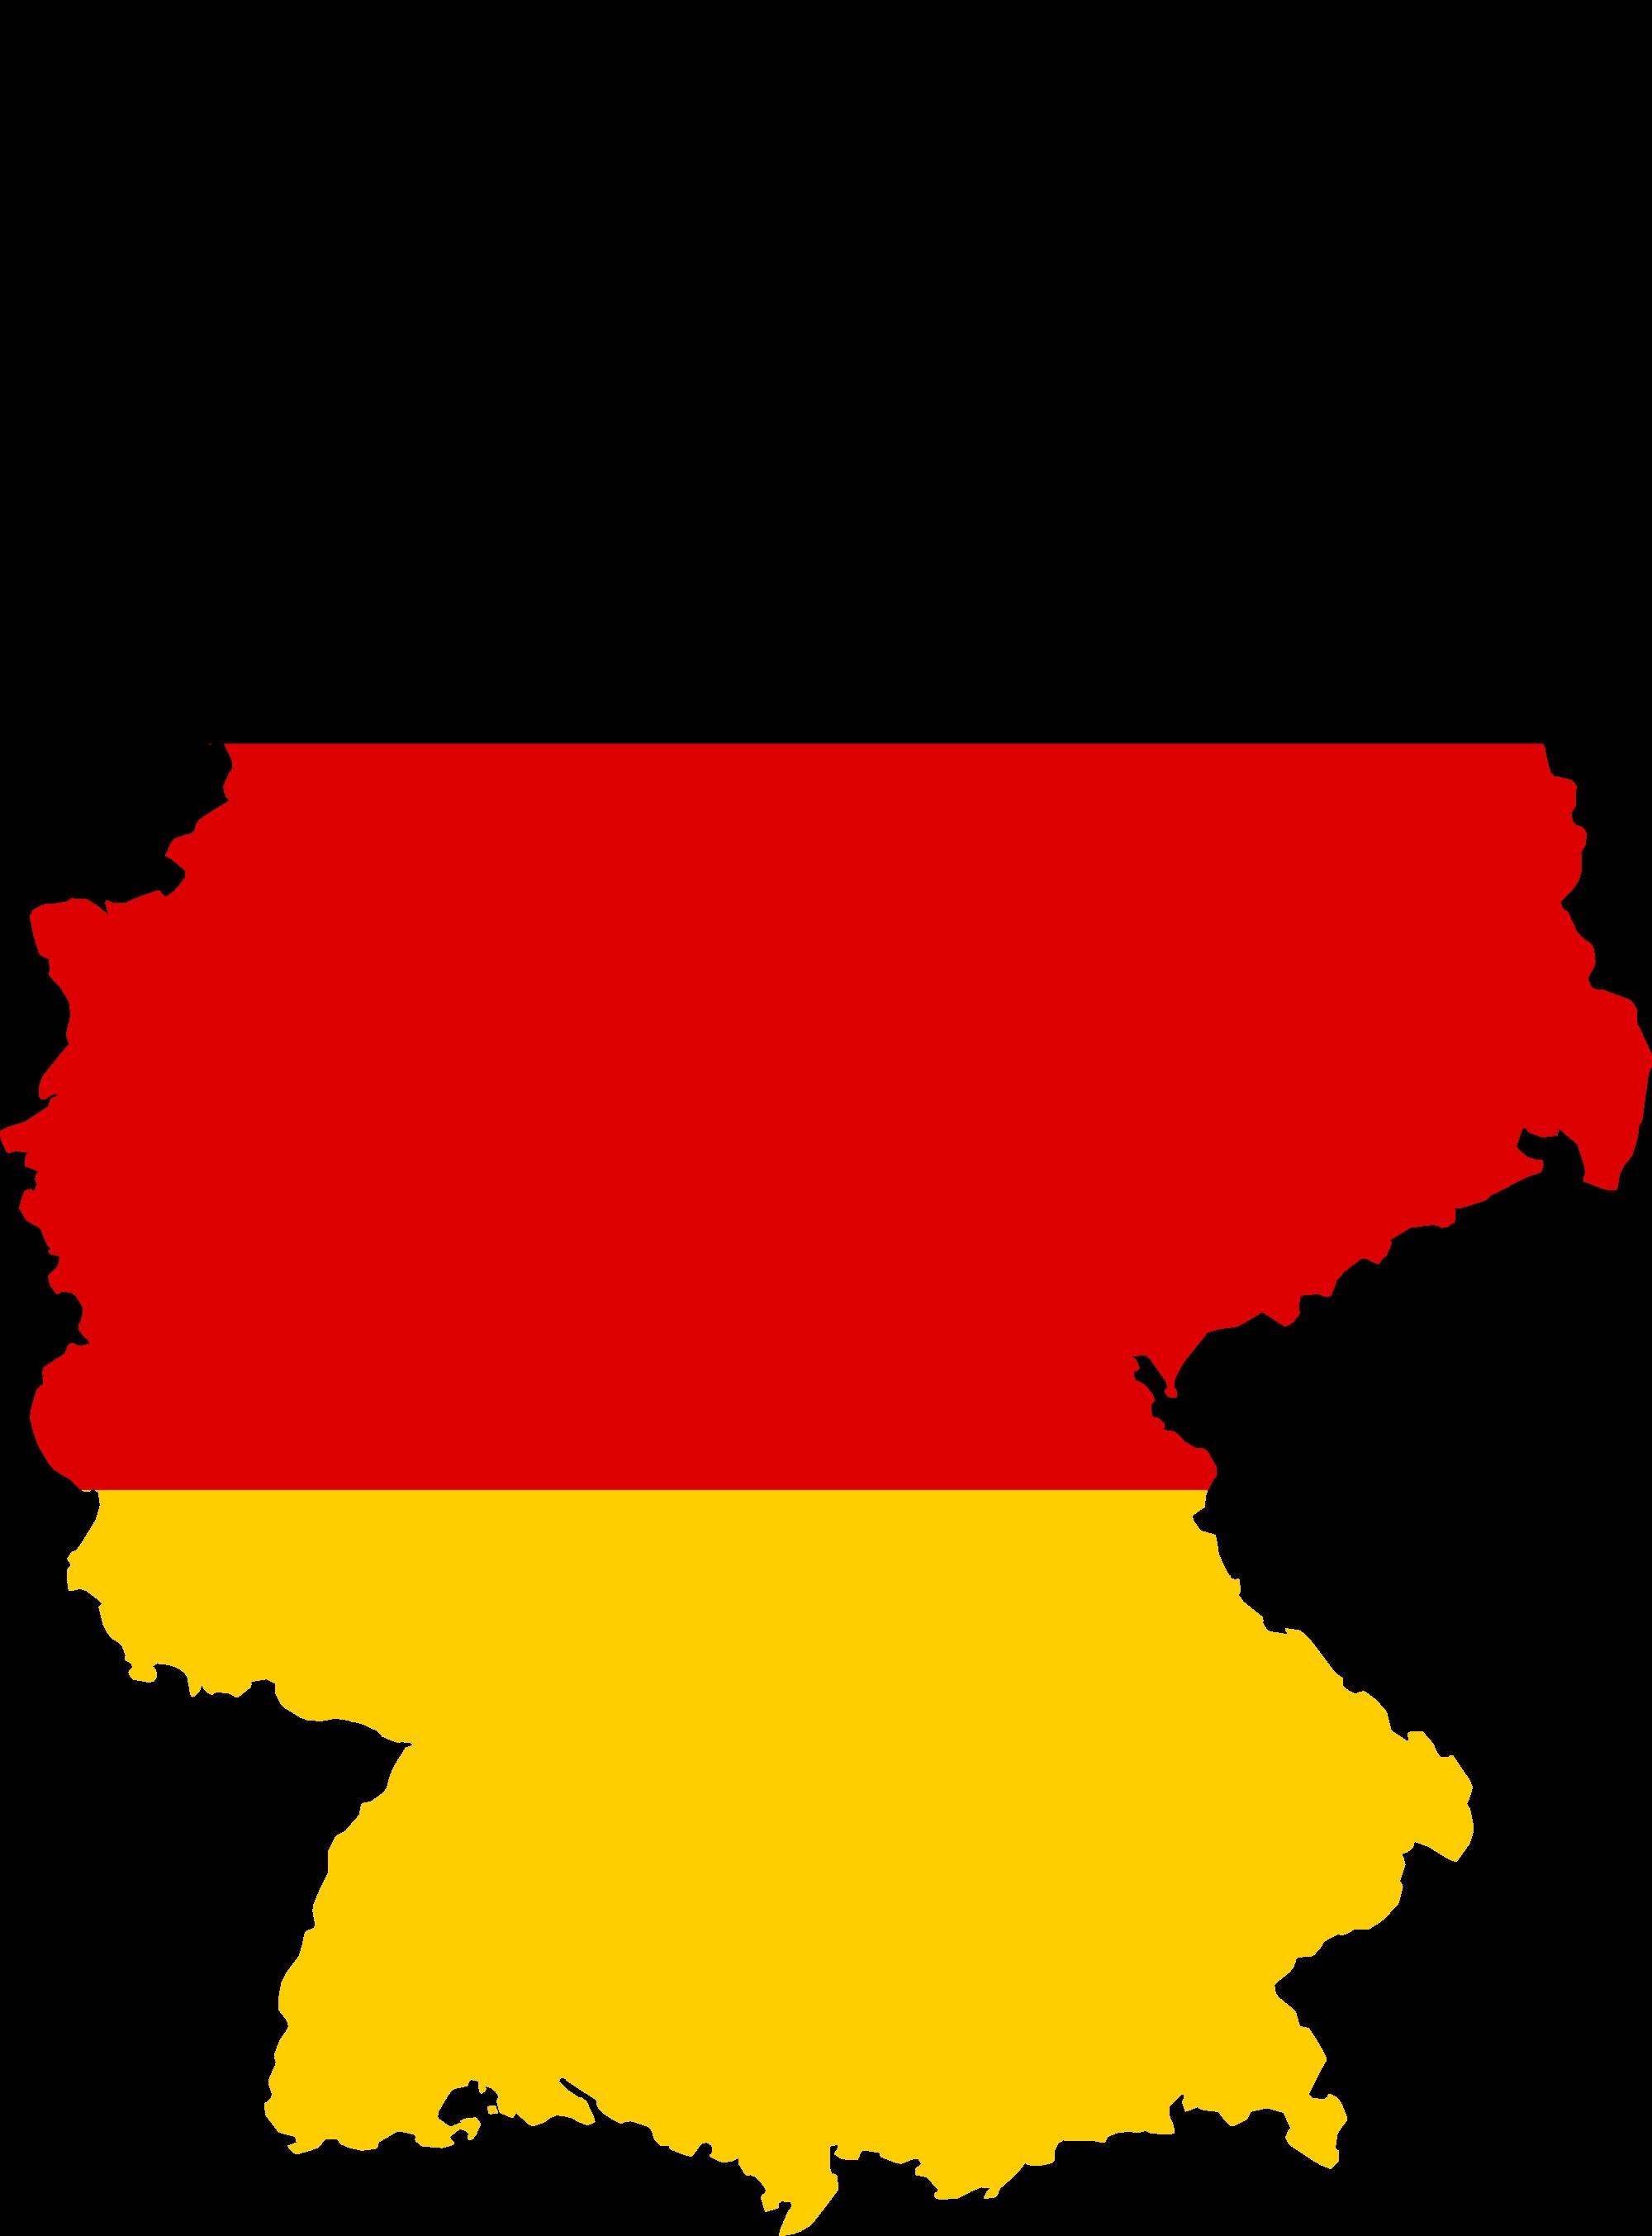 Waterfalls in Germany.